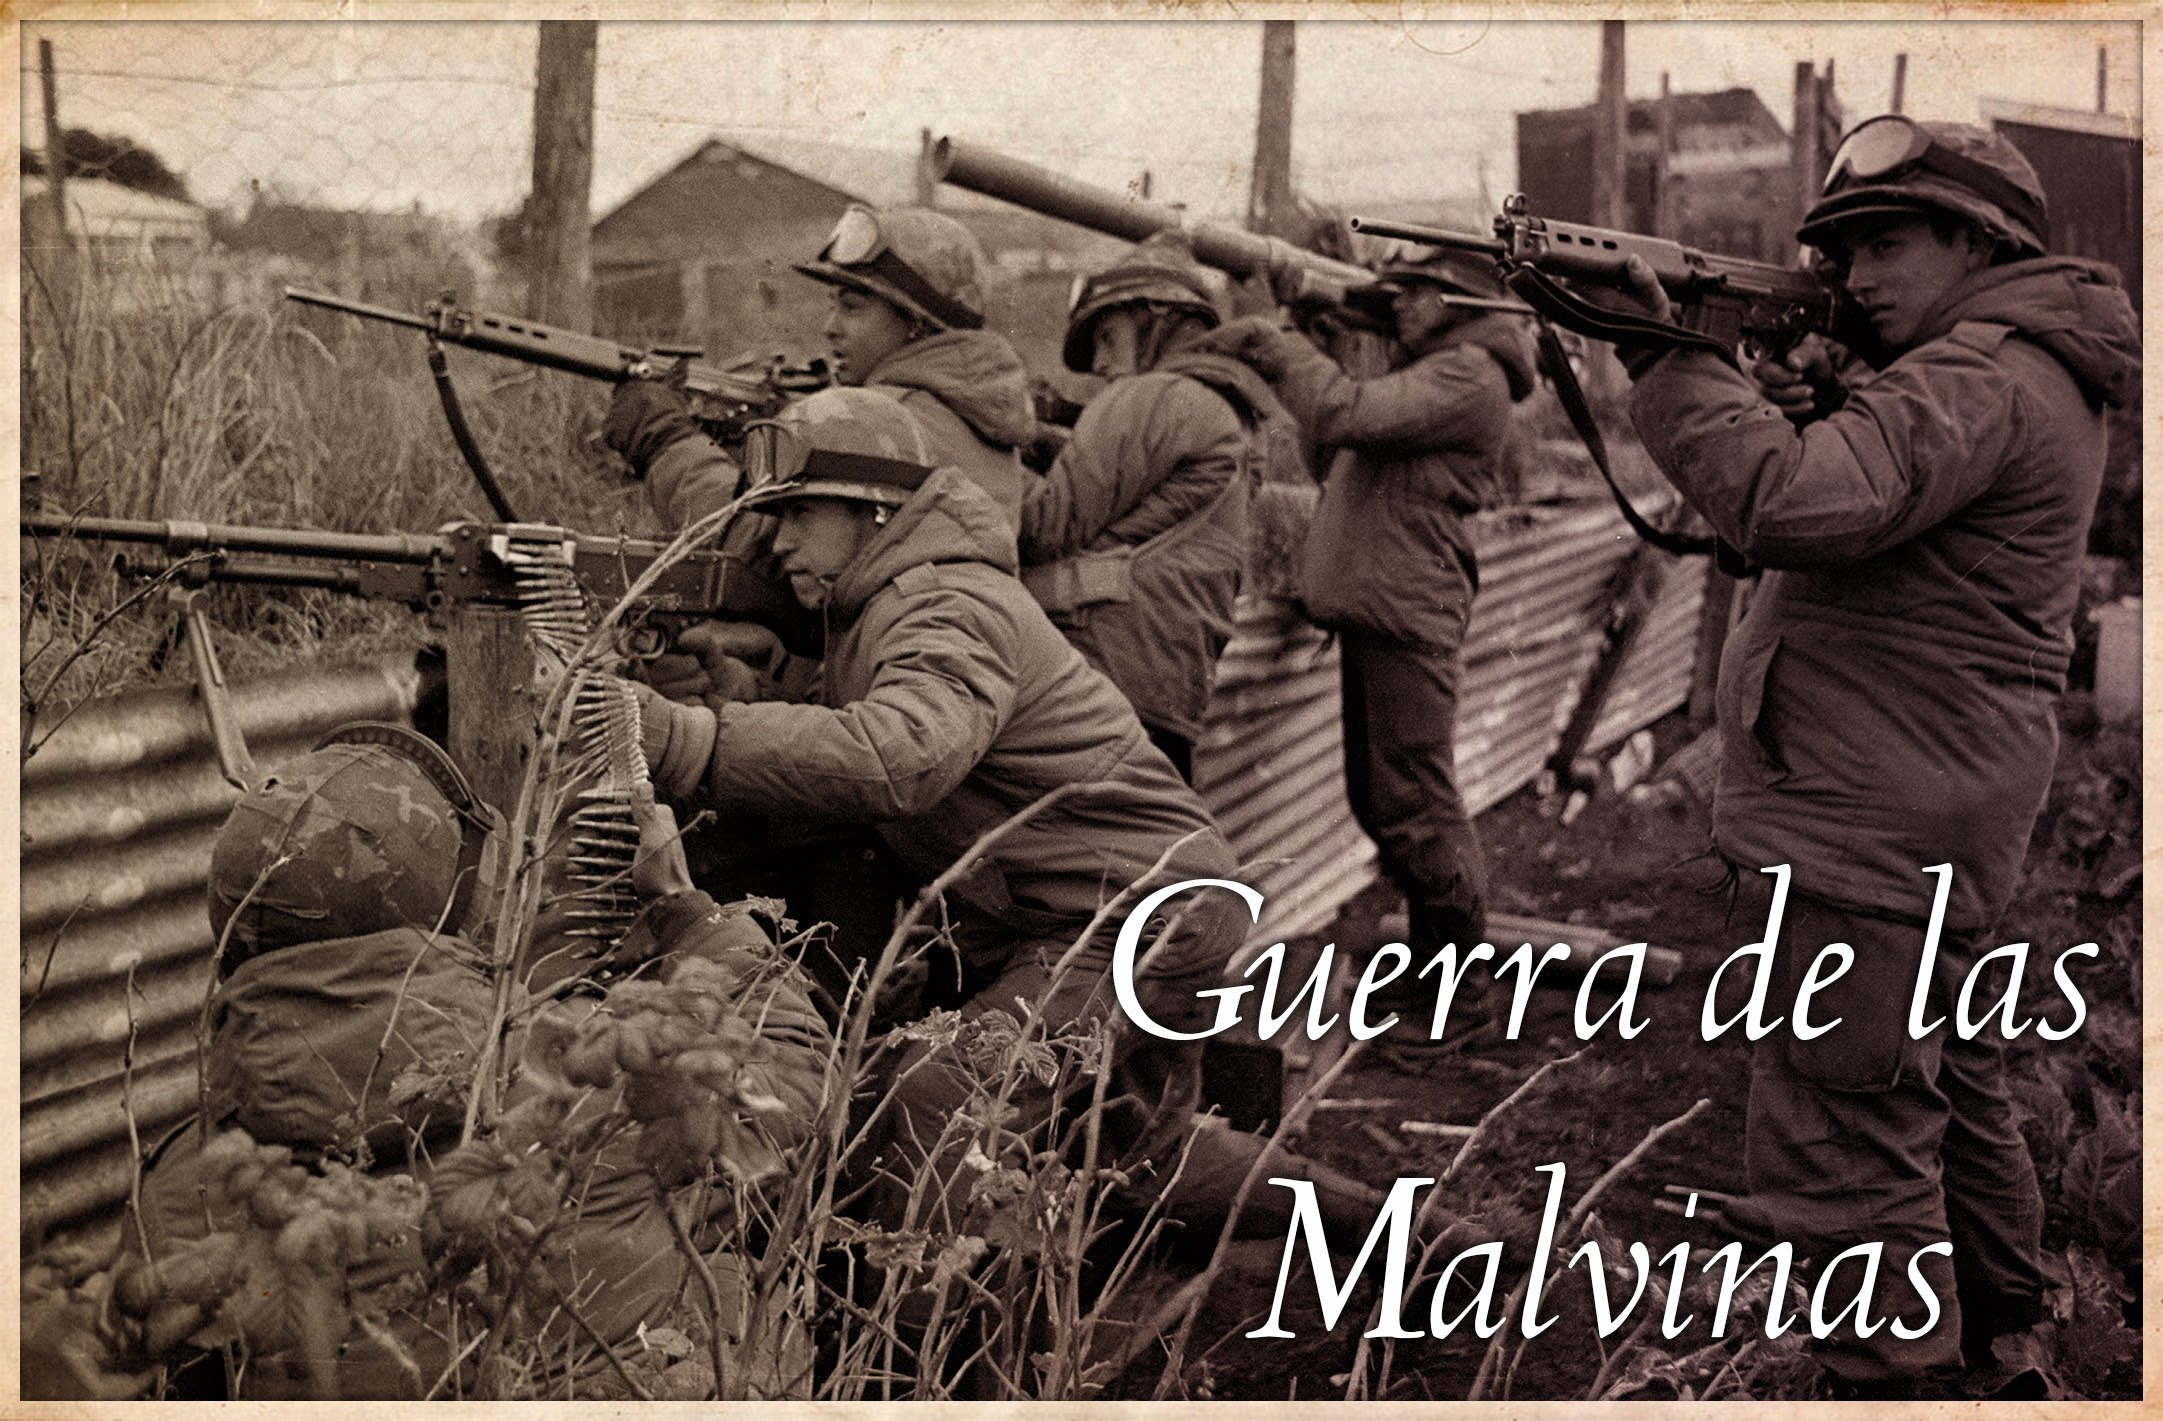 Santa TEresita buenos Aires Malvinas